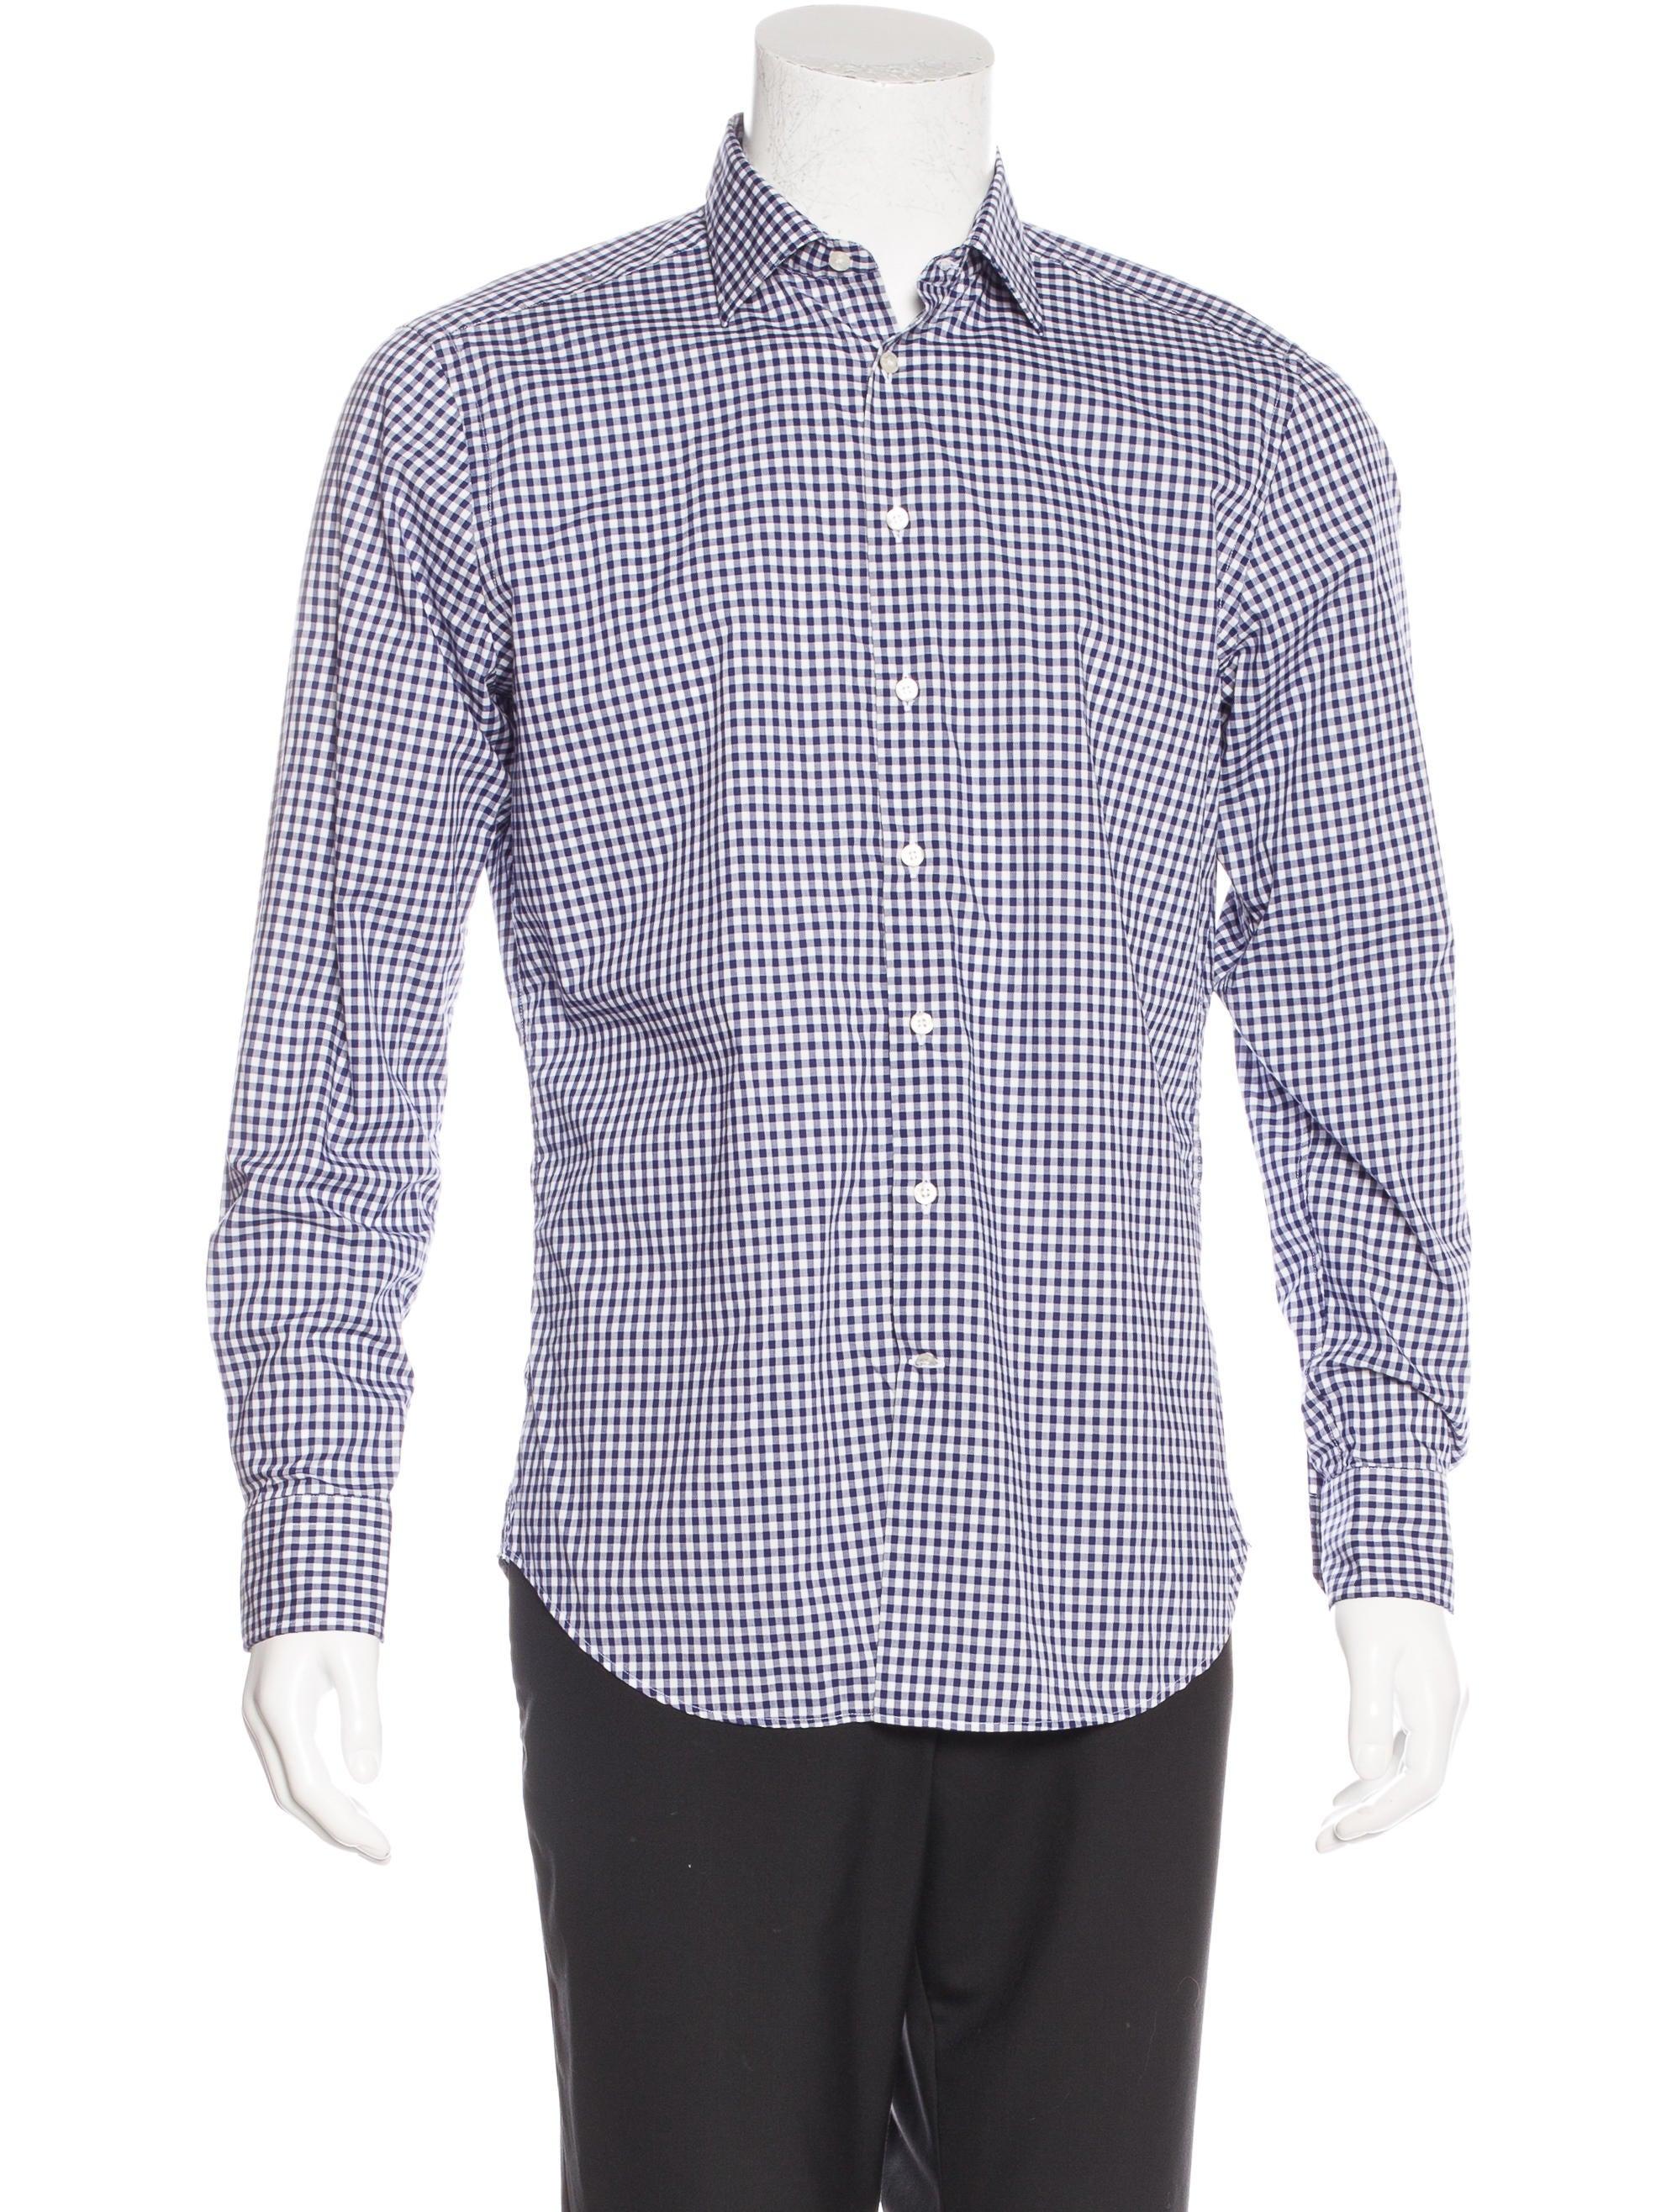 Etro gingham dress shirt clothing etr44634 the realreal for Gingham dress shirt men